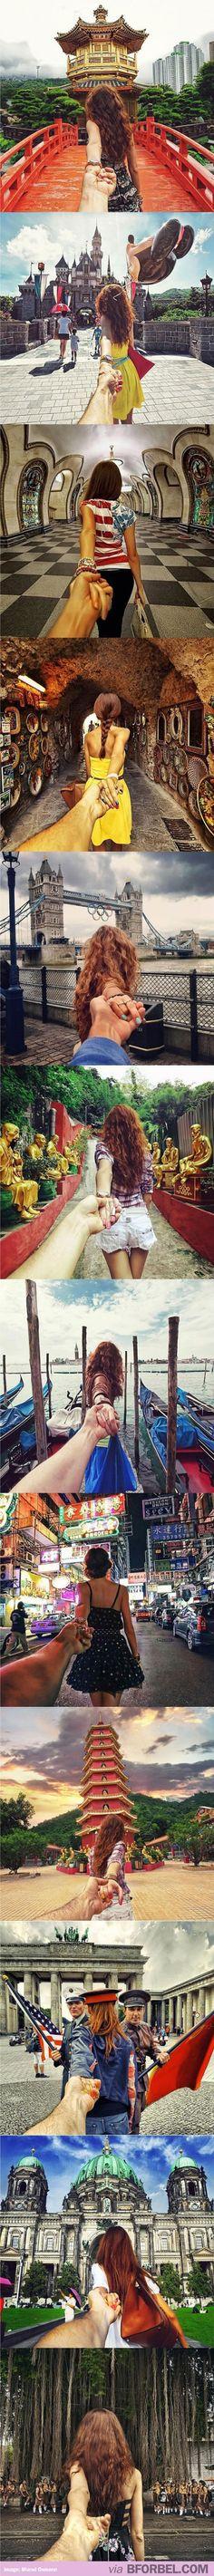 Girl leads boyfriend around the world on Instagram posts #photography #travel